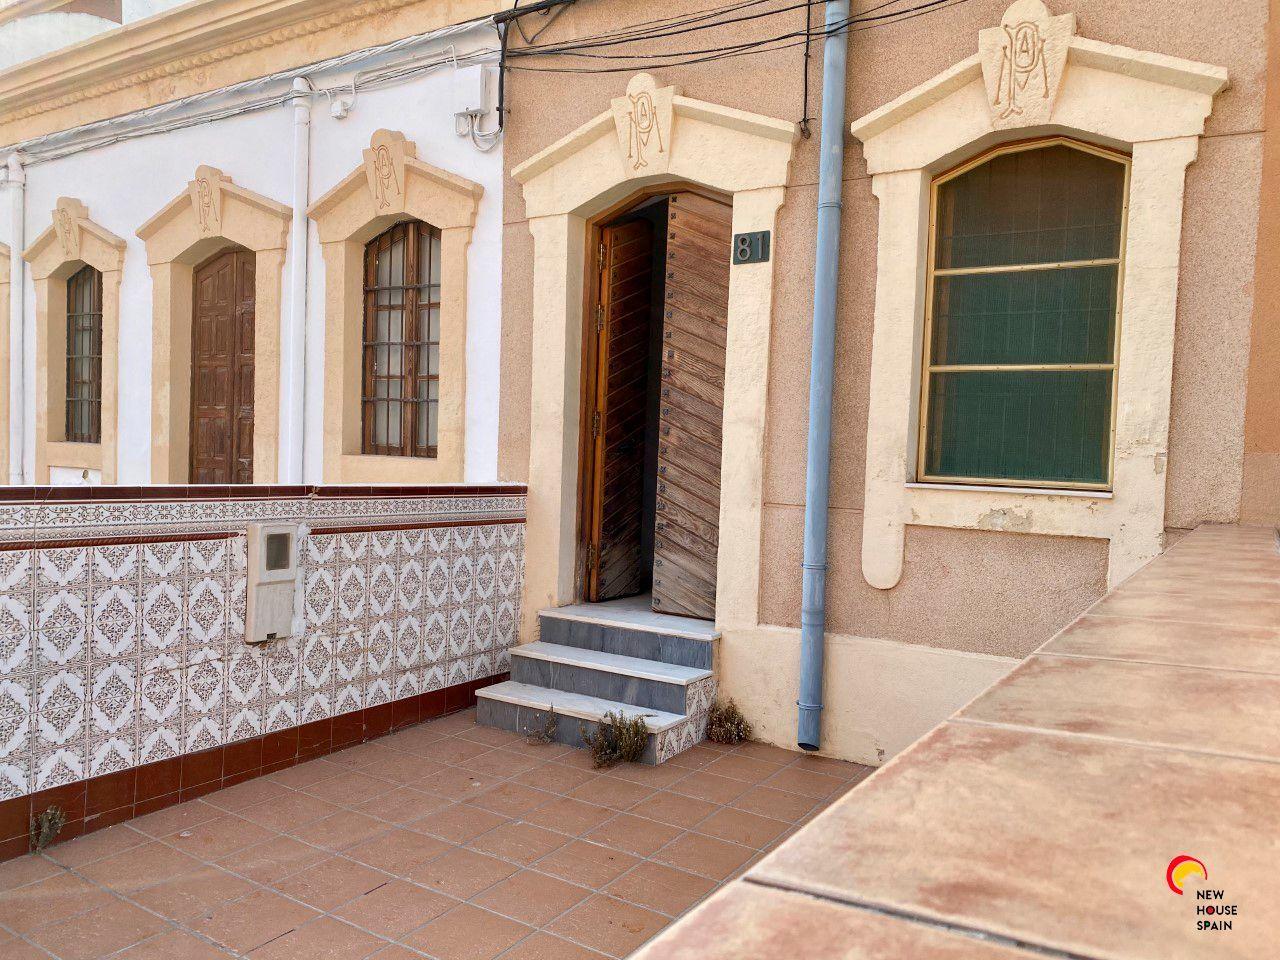 Villa in Almería, Centro, for sale